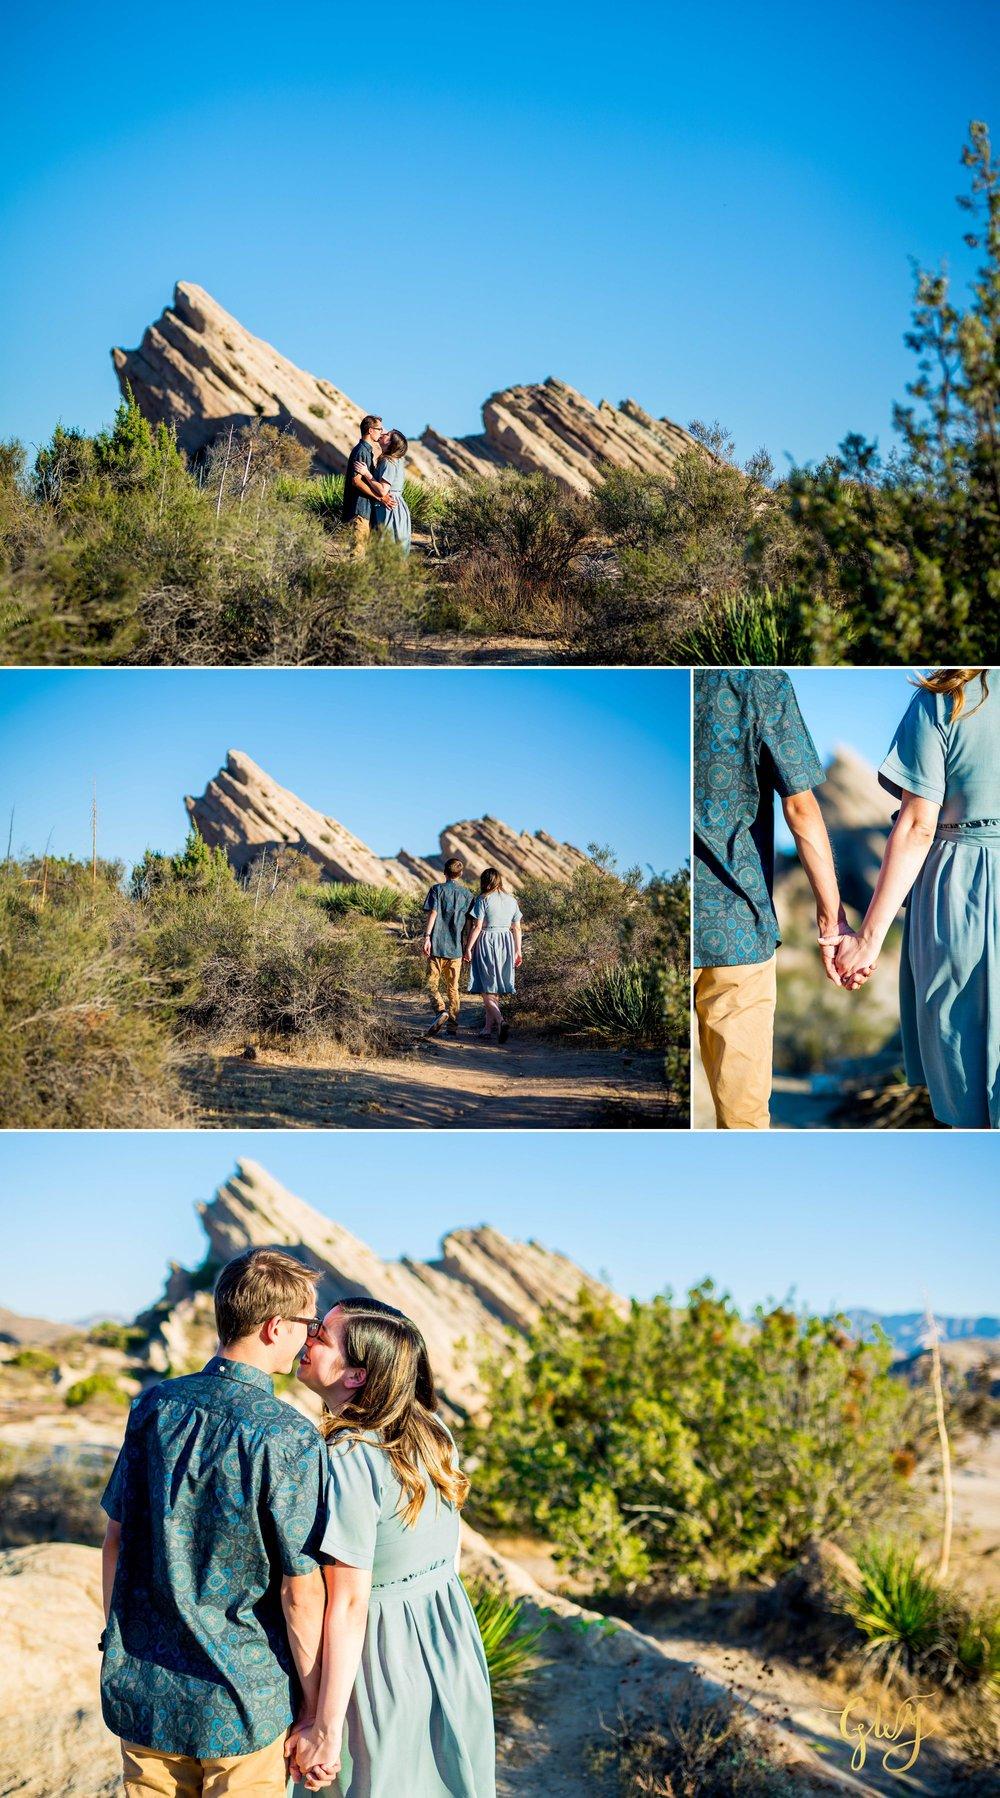 KJ + Maddie Vasquez Rocks Adventurous Hiking Outdoors Engagement Session by Glass Woods Media 1.jpg